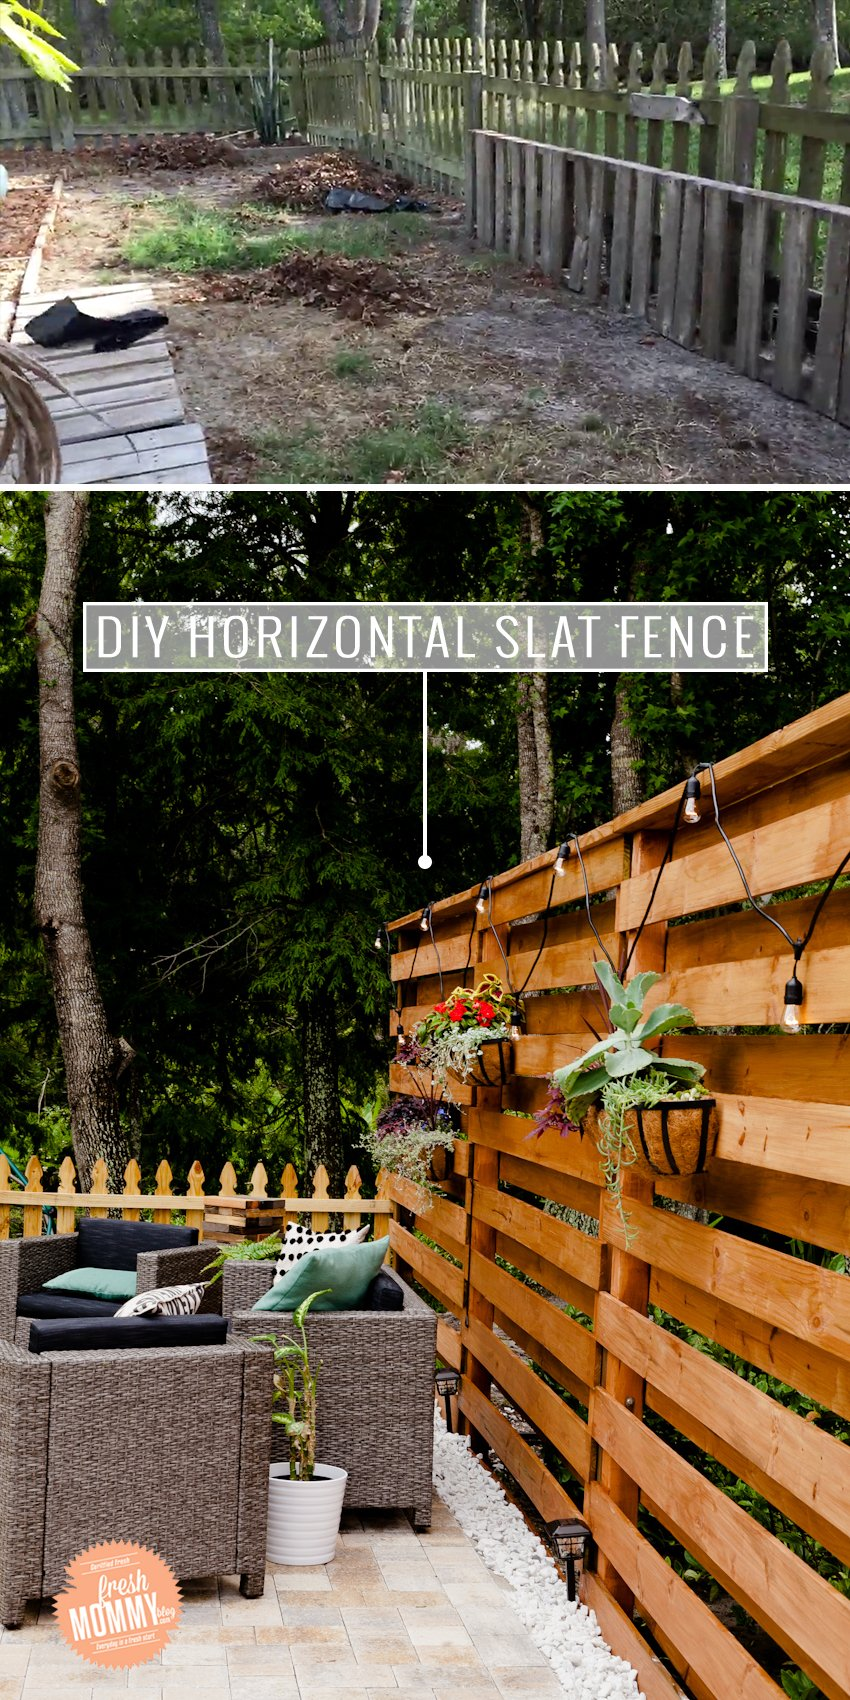 Stunning Diy Horizontal Slat Fence Lifestyle Fresh Mommy Blog